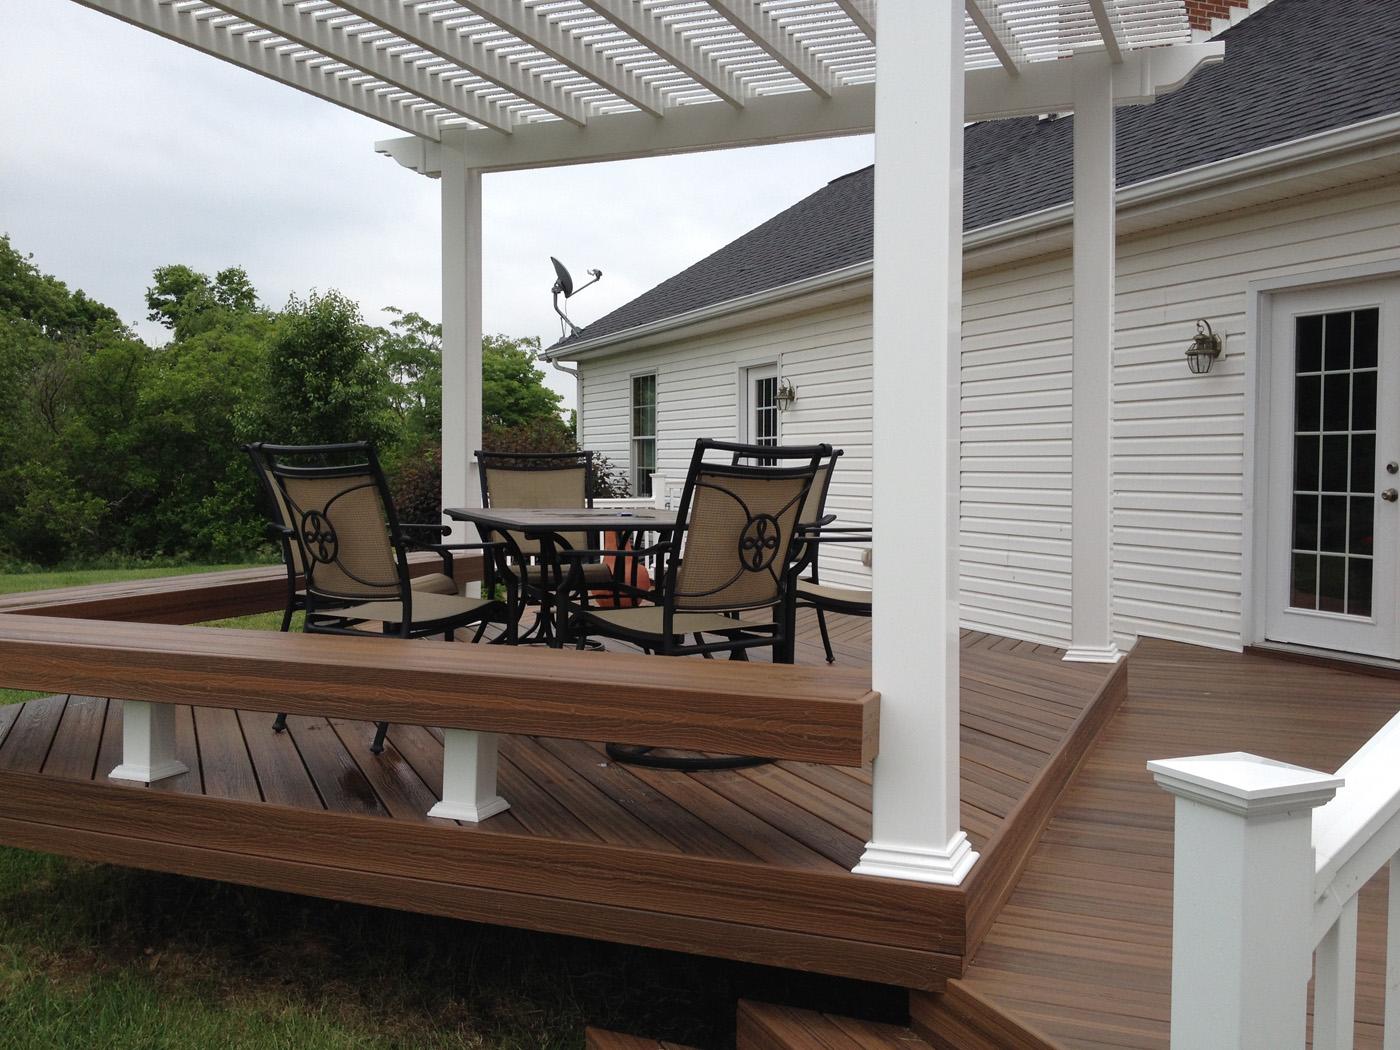 Deck Design Ideas Real Wood Vs Decks That Look Like Wood